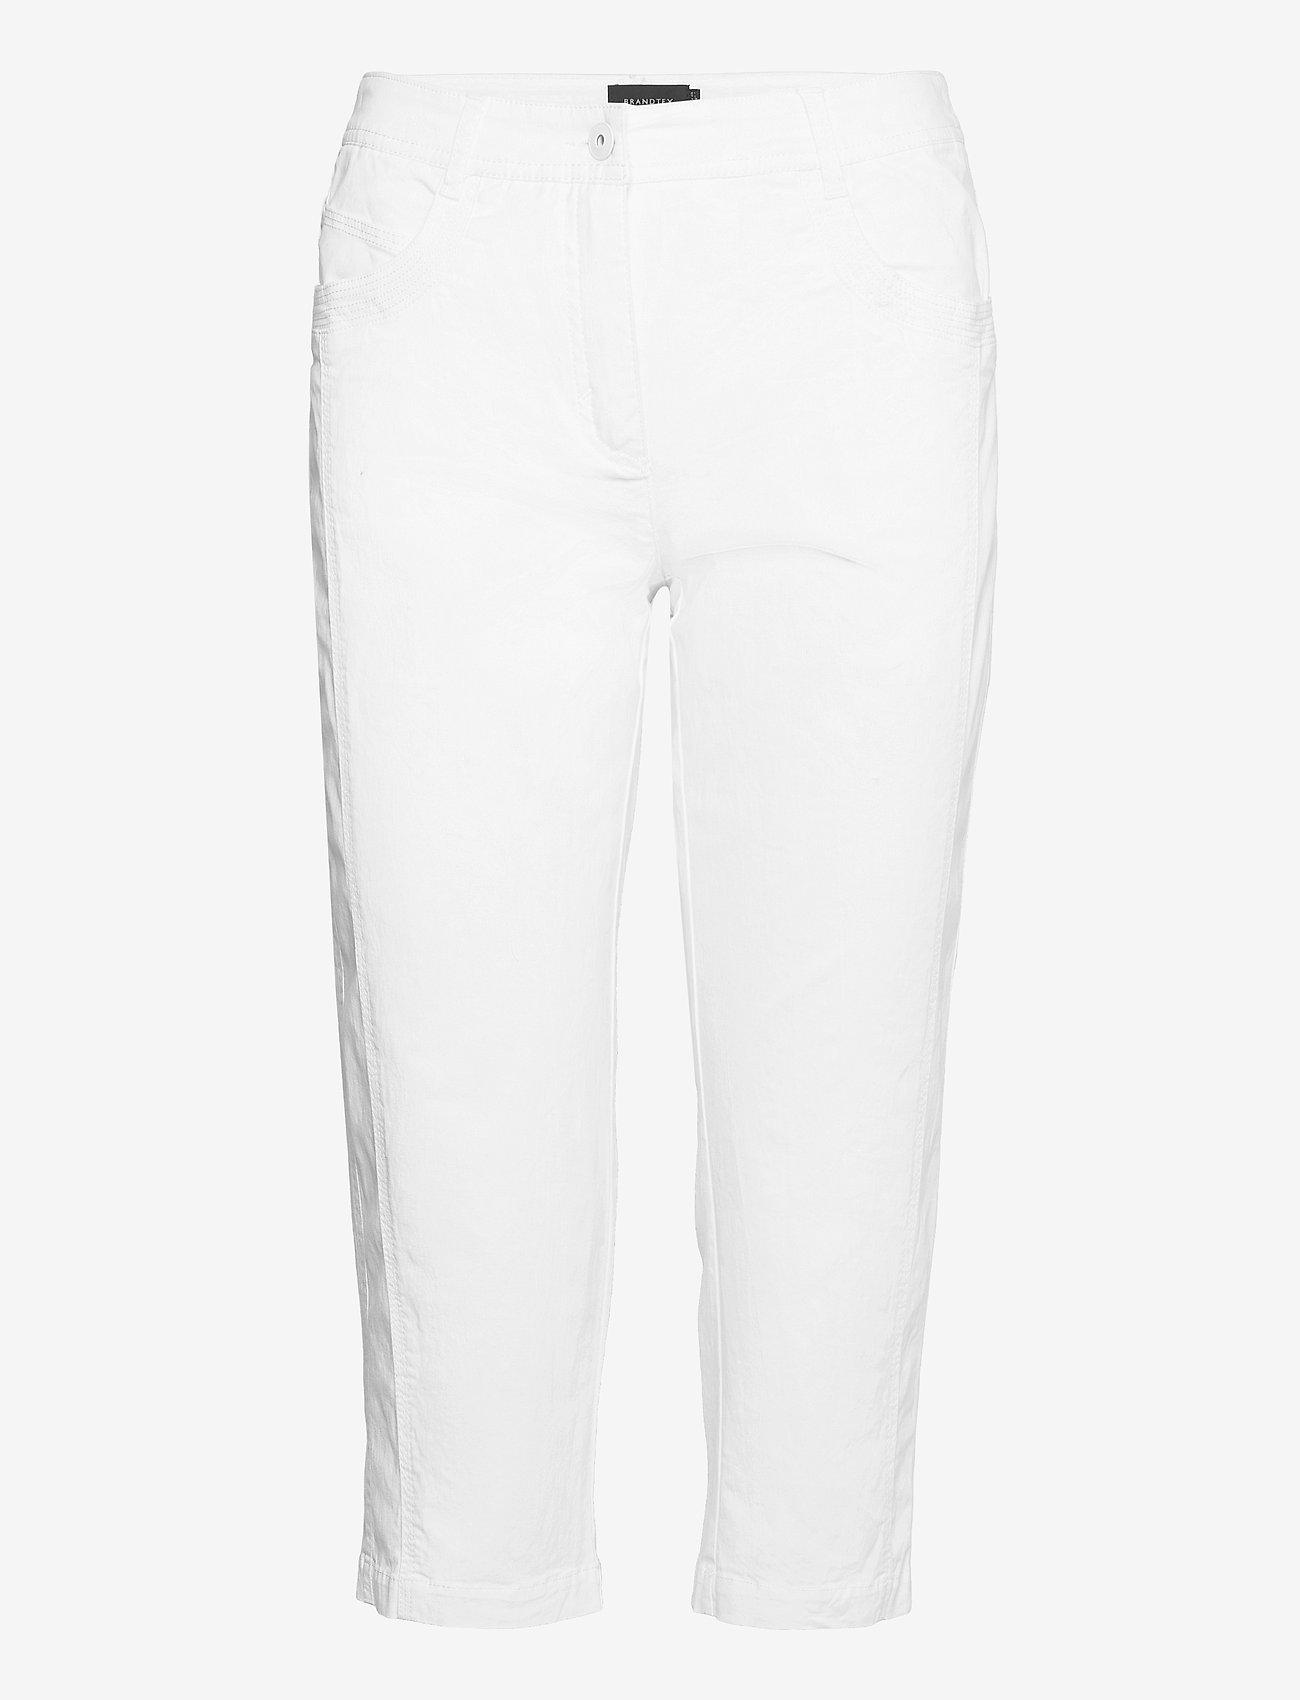 Brandtex - Capri pants - capri bukser - white - 0